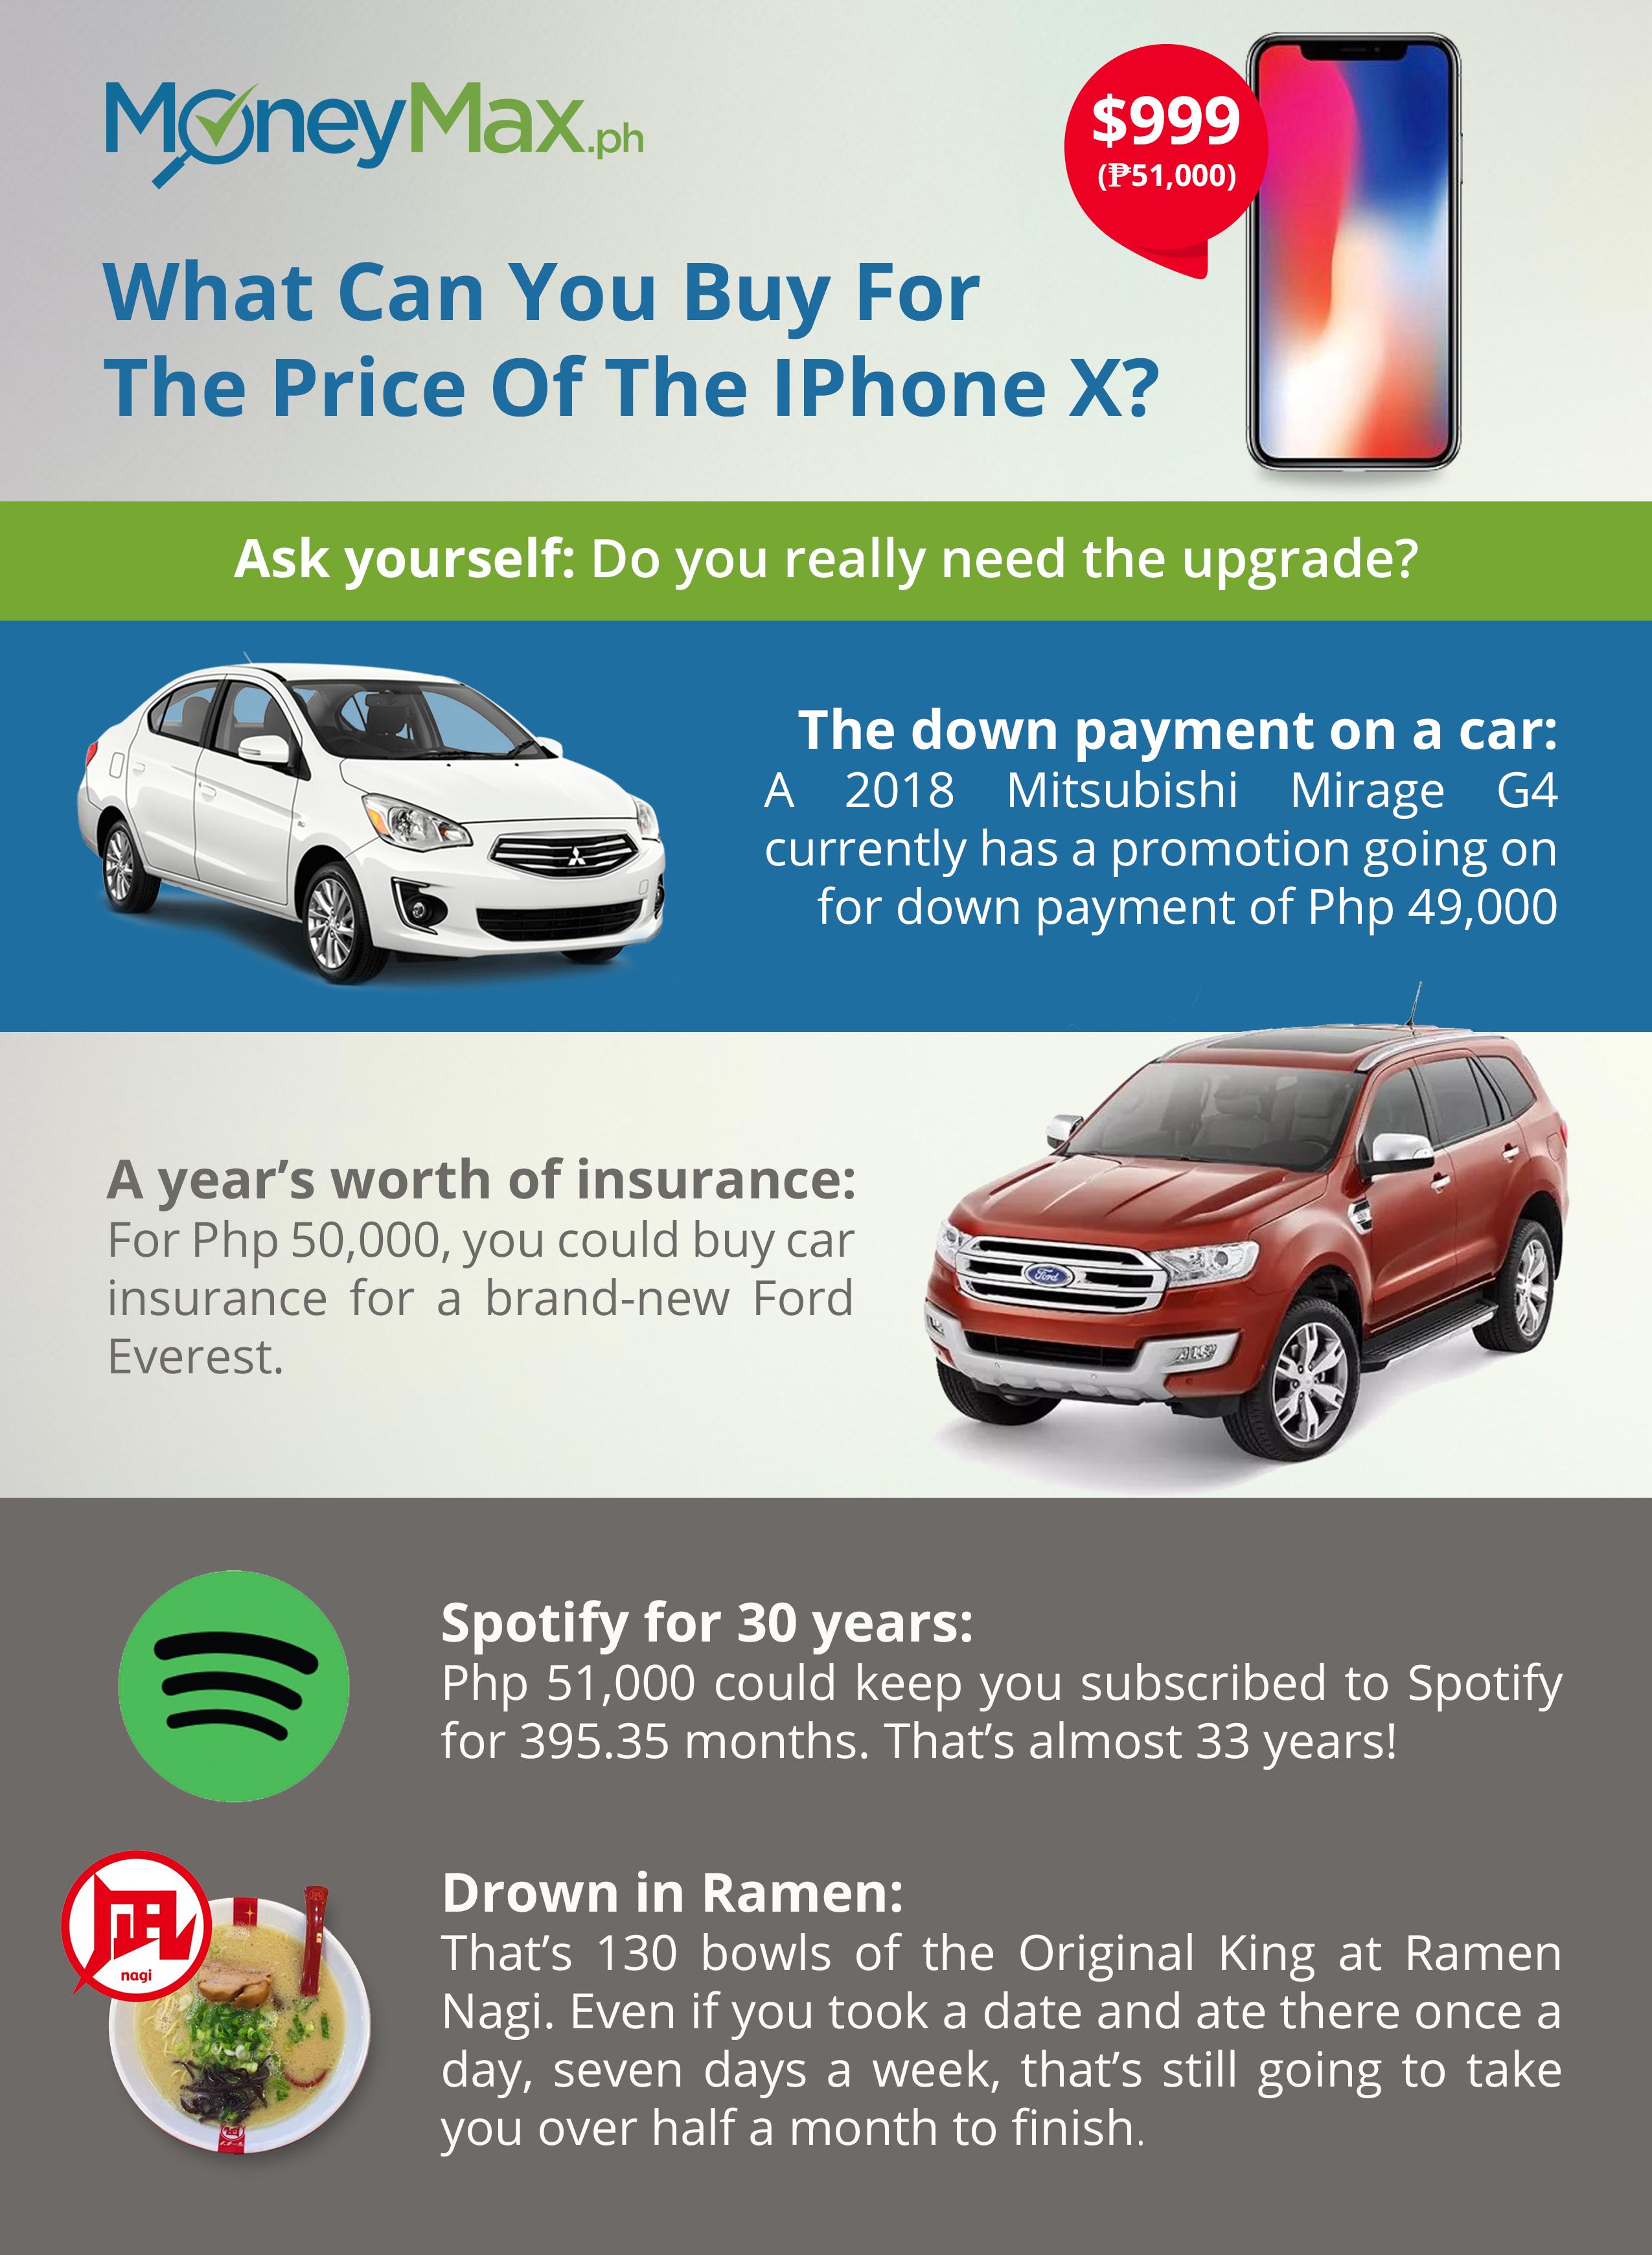 MoneyMaxph_IPhoneX_Article